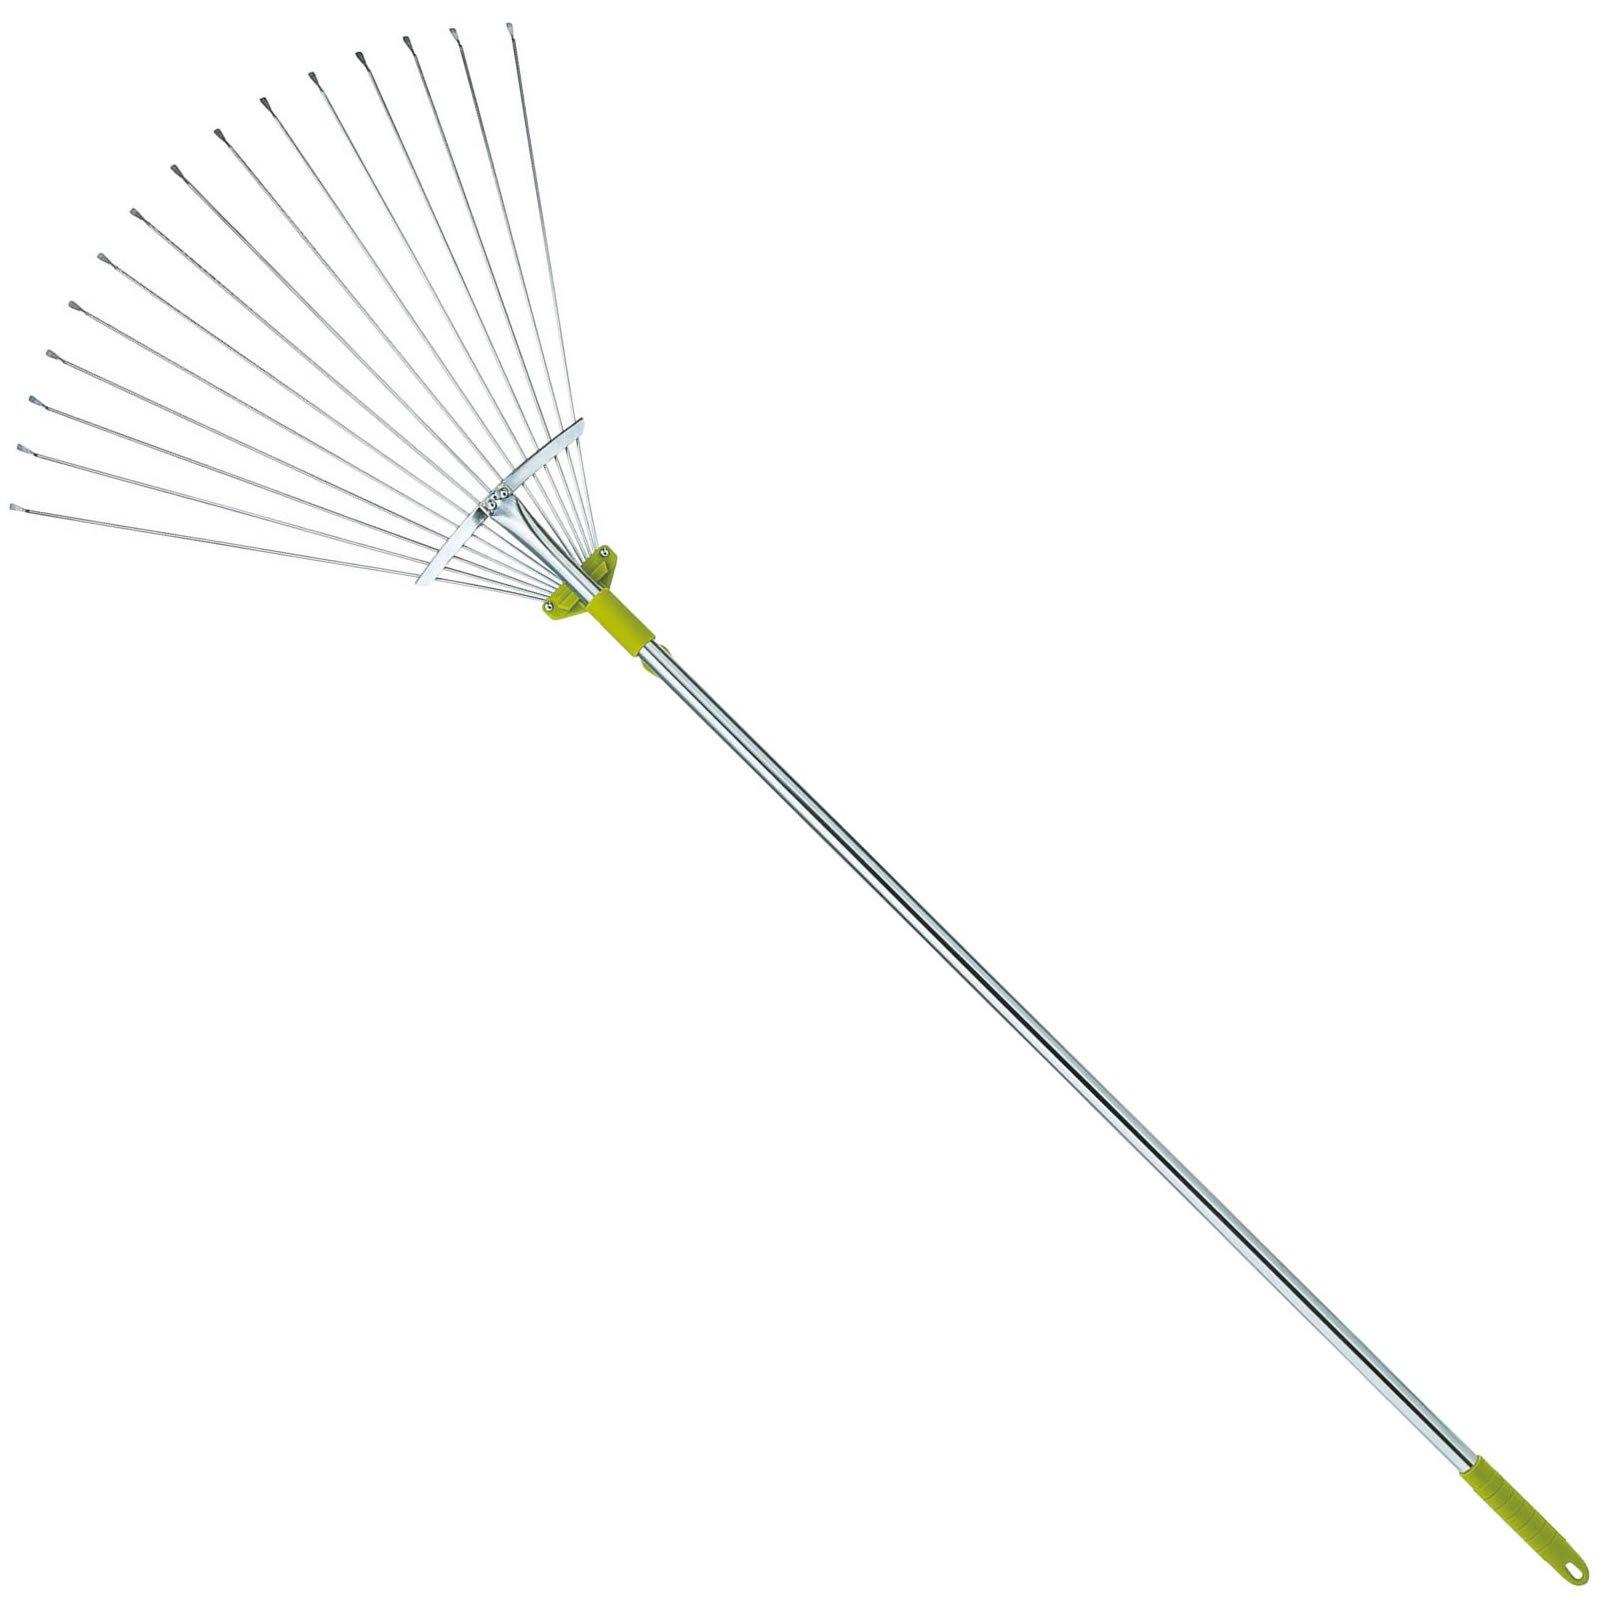 63 Inch Adjustable Garden Leaf Rake - Expanding Metal Rake - Adjustable Folding Head From 7 Inch to 22 Inch. Ideal Camp Rake by Gardenite